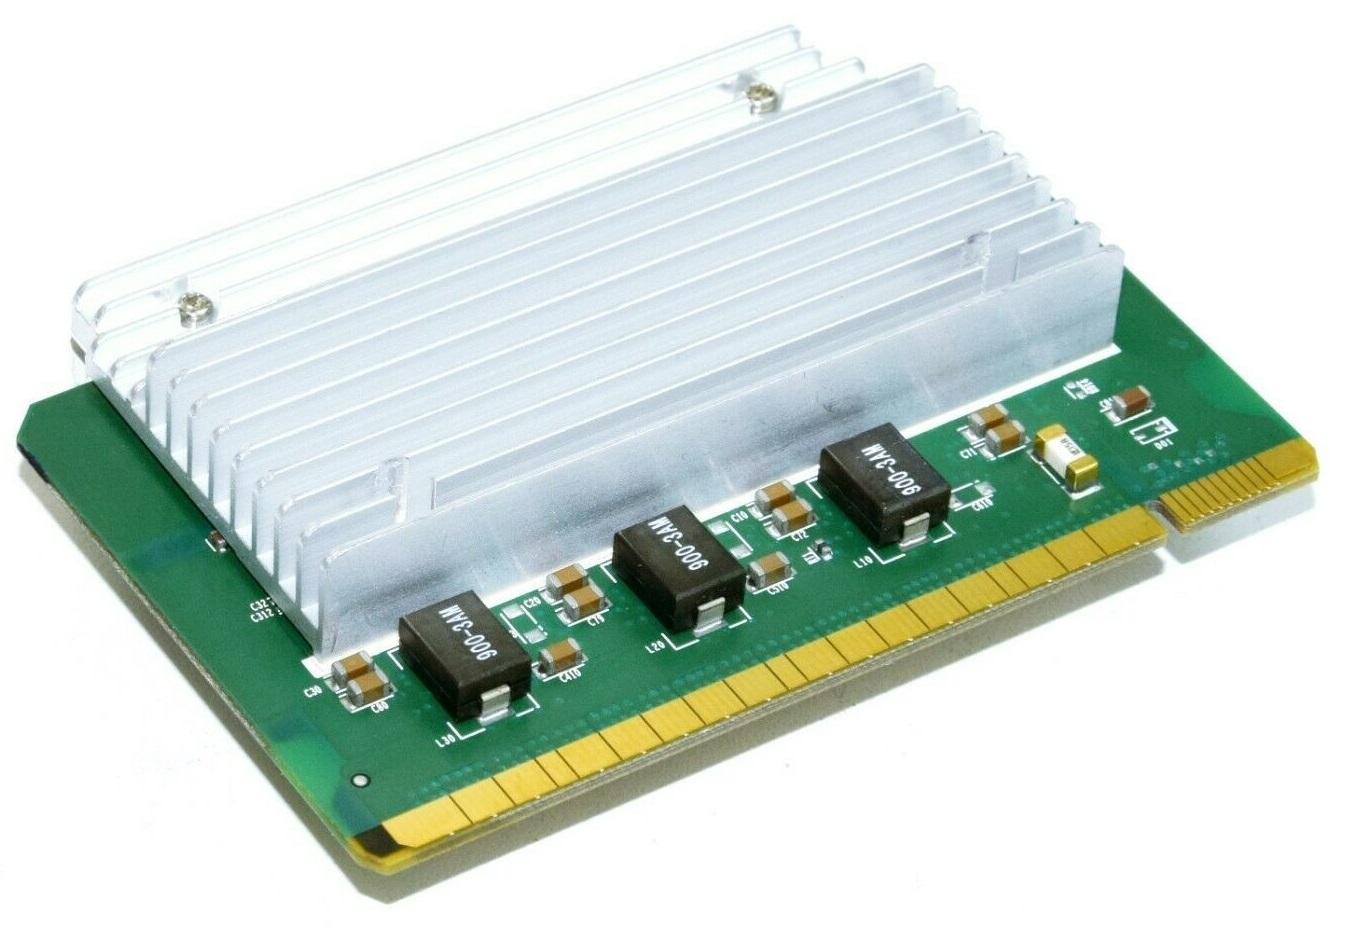 407748-001 POWER MODULE VRM DL380 G5